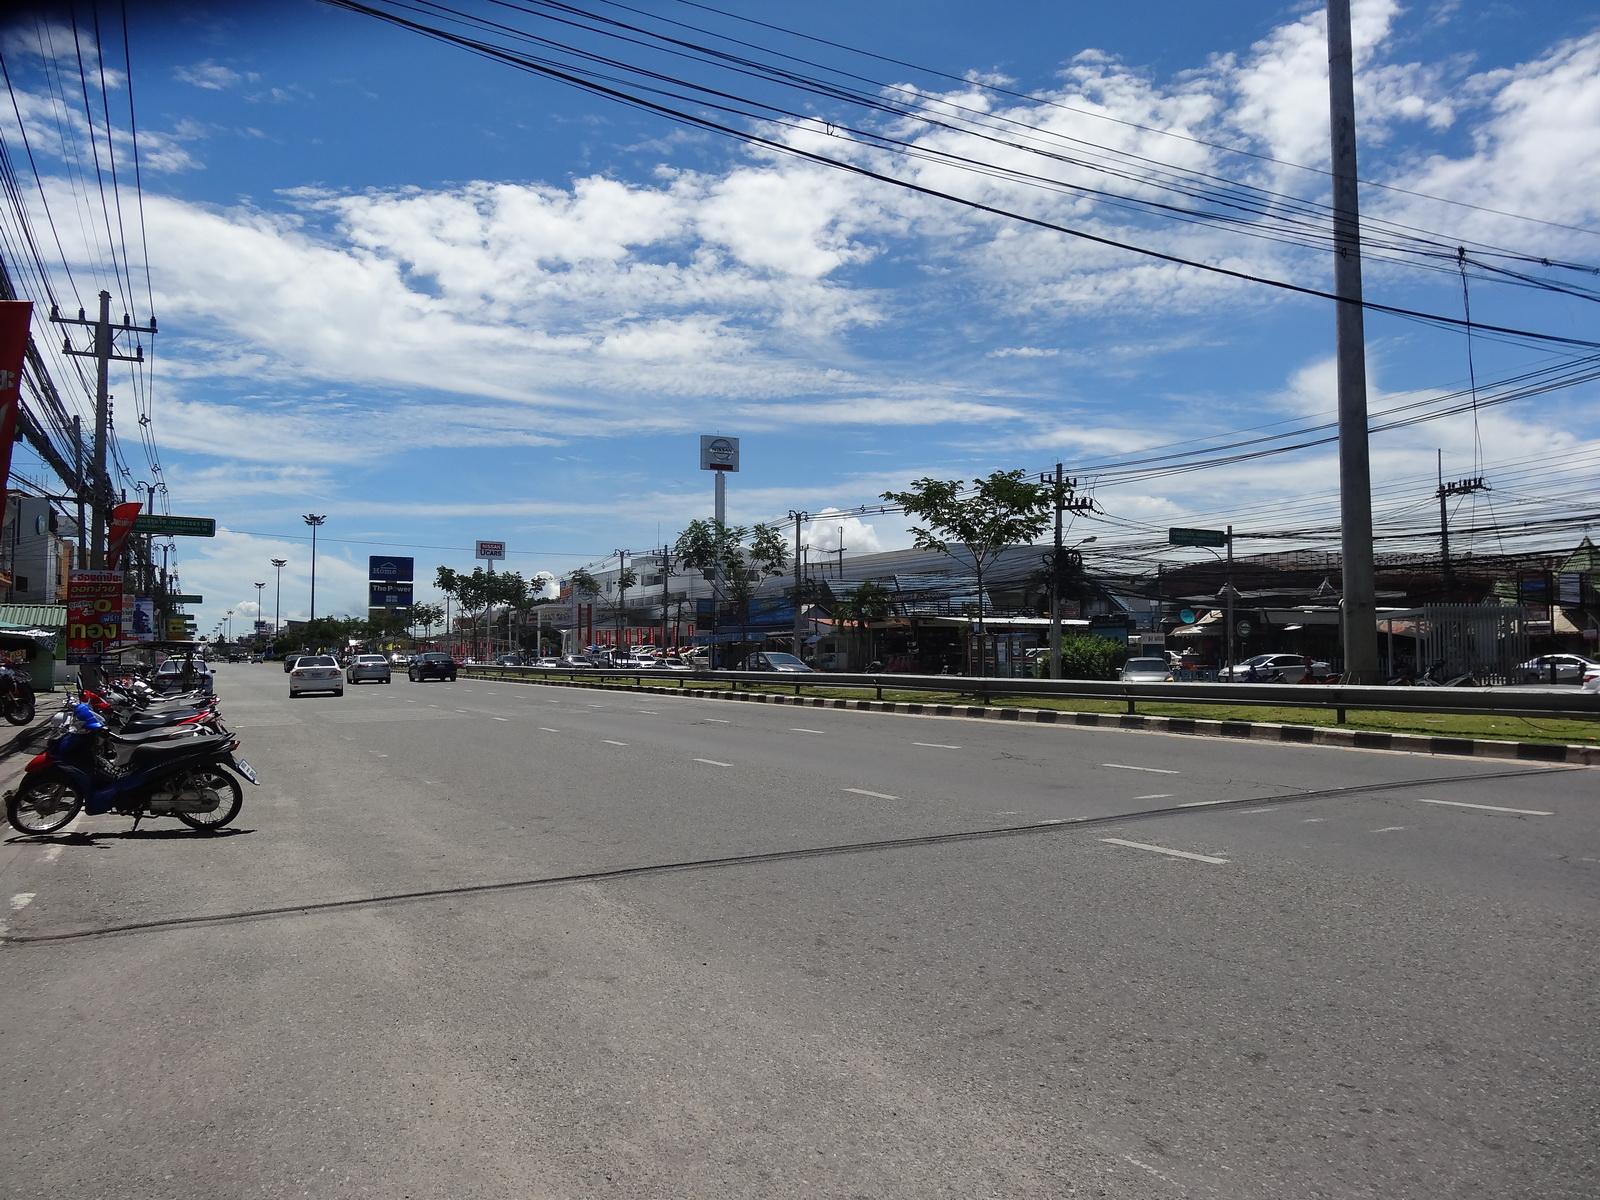 06 Rayong Tour 04